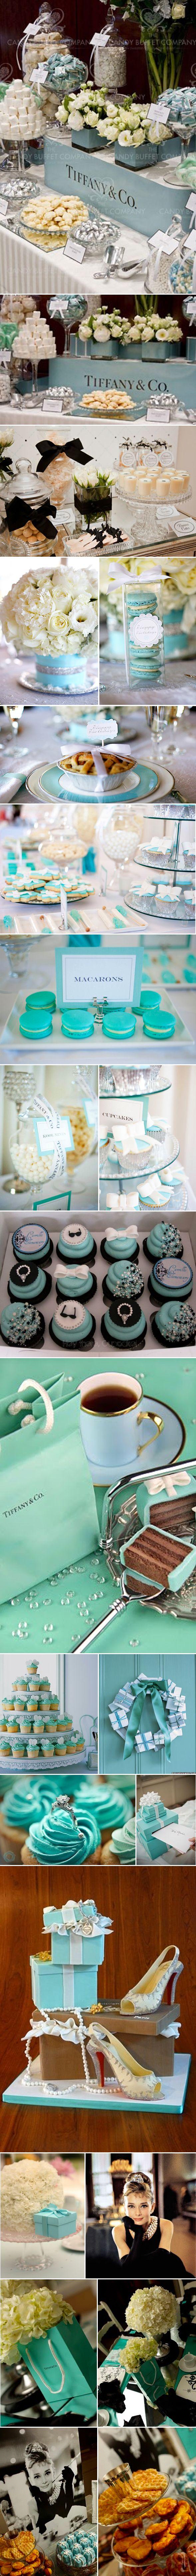 Tiffany & Co bridal shower...yes.